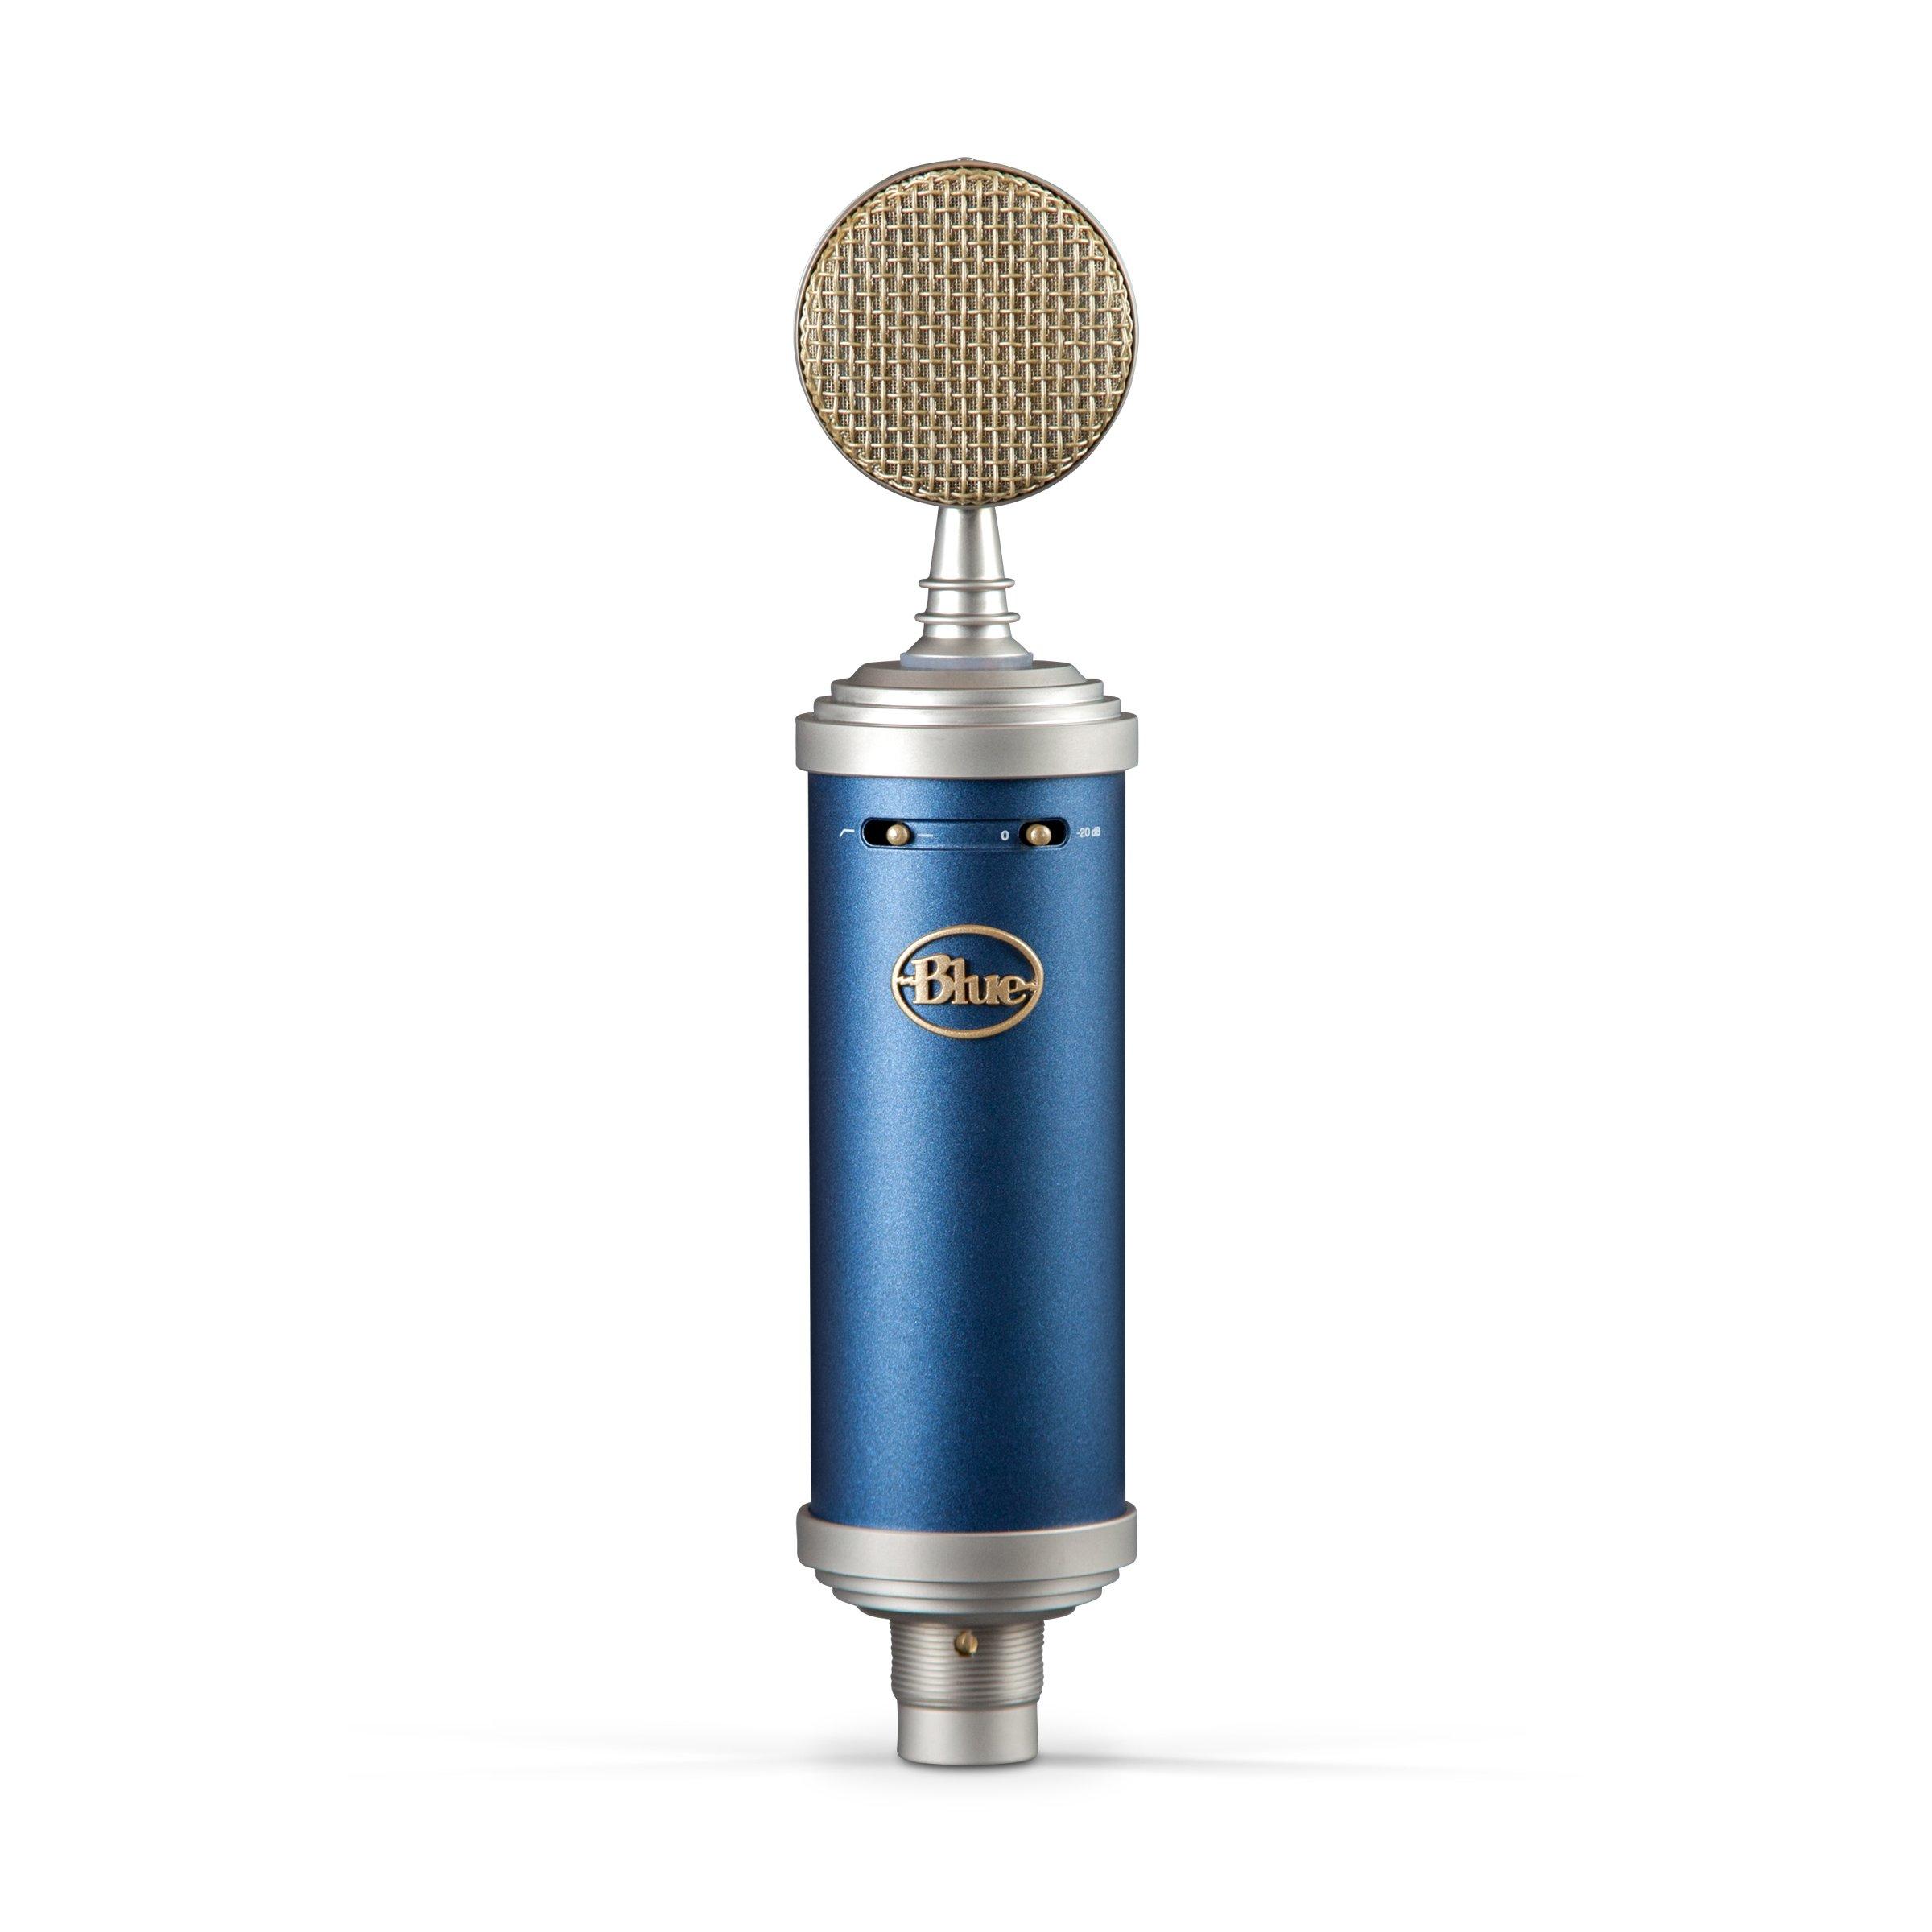 Blue Microphones Bluebird SL Large-Diaphragm Condenser Microphone